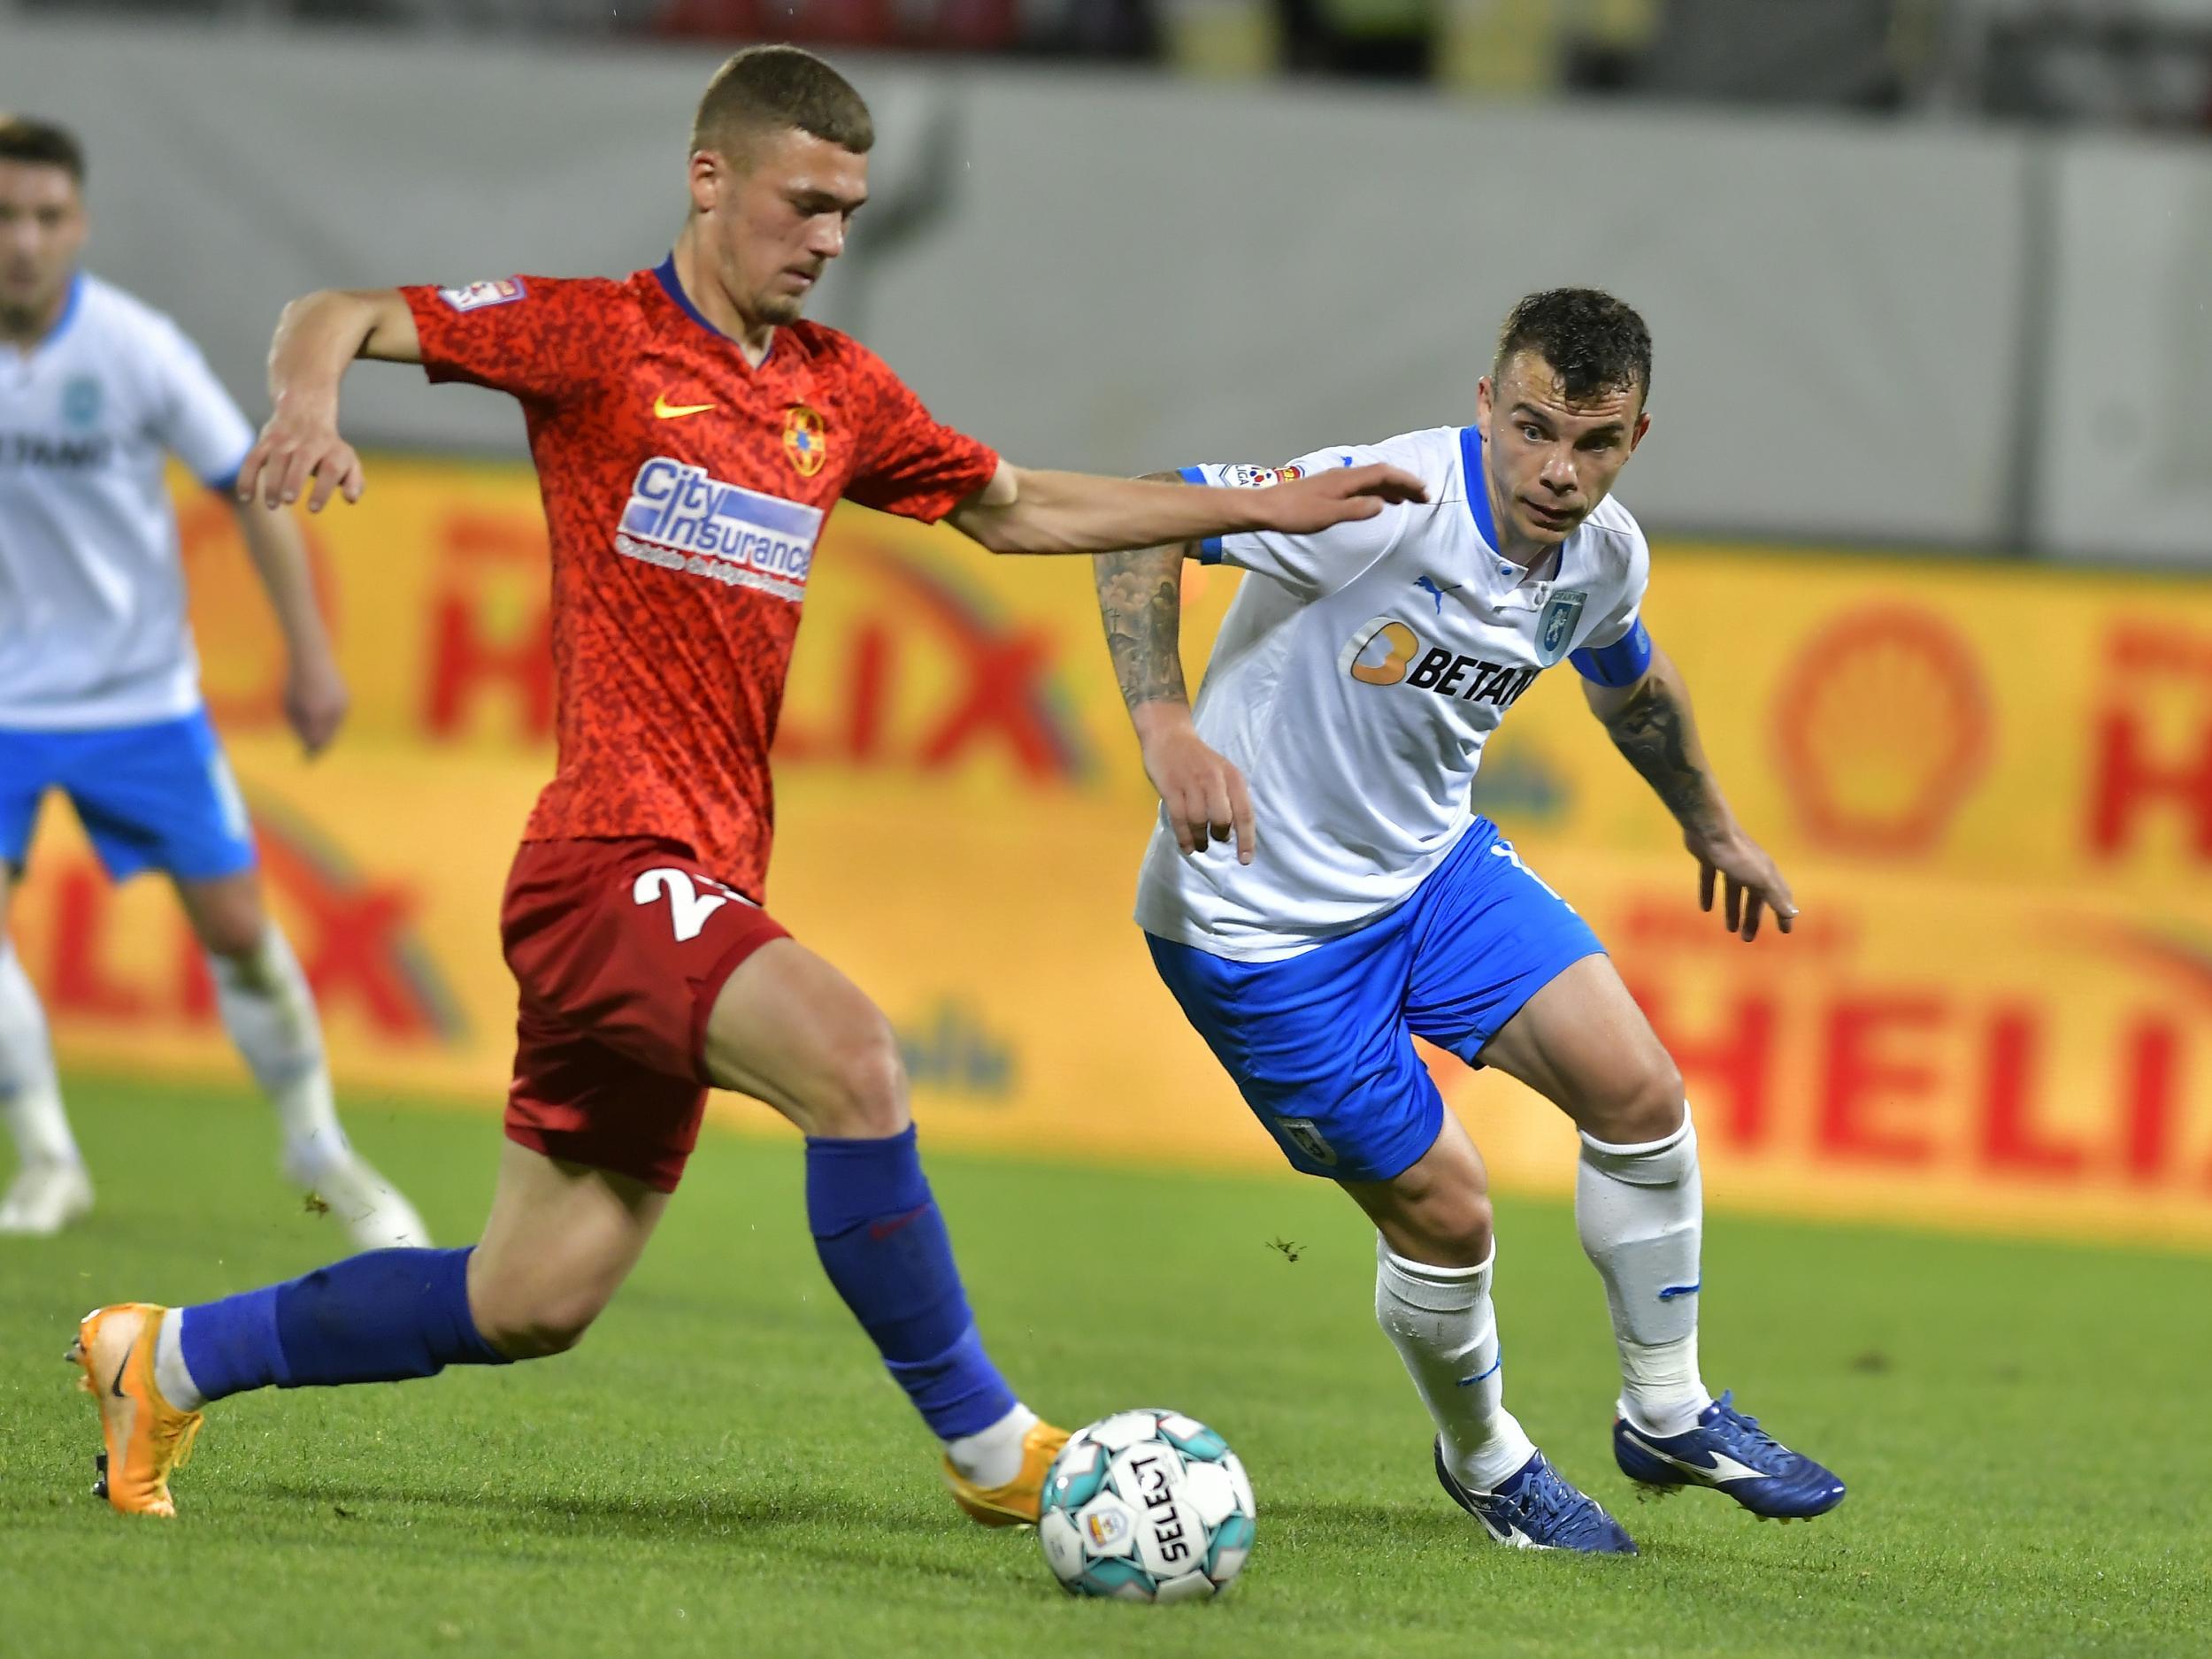 FCSB - CRAIOVA 0-1